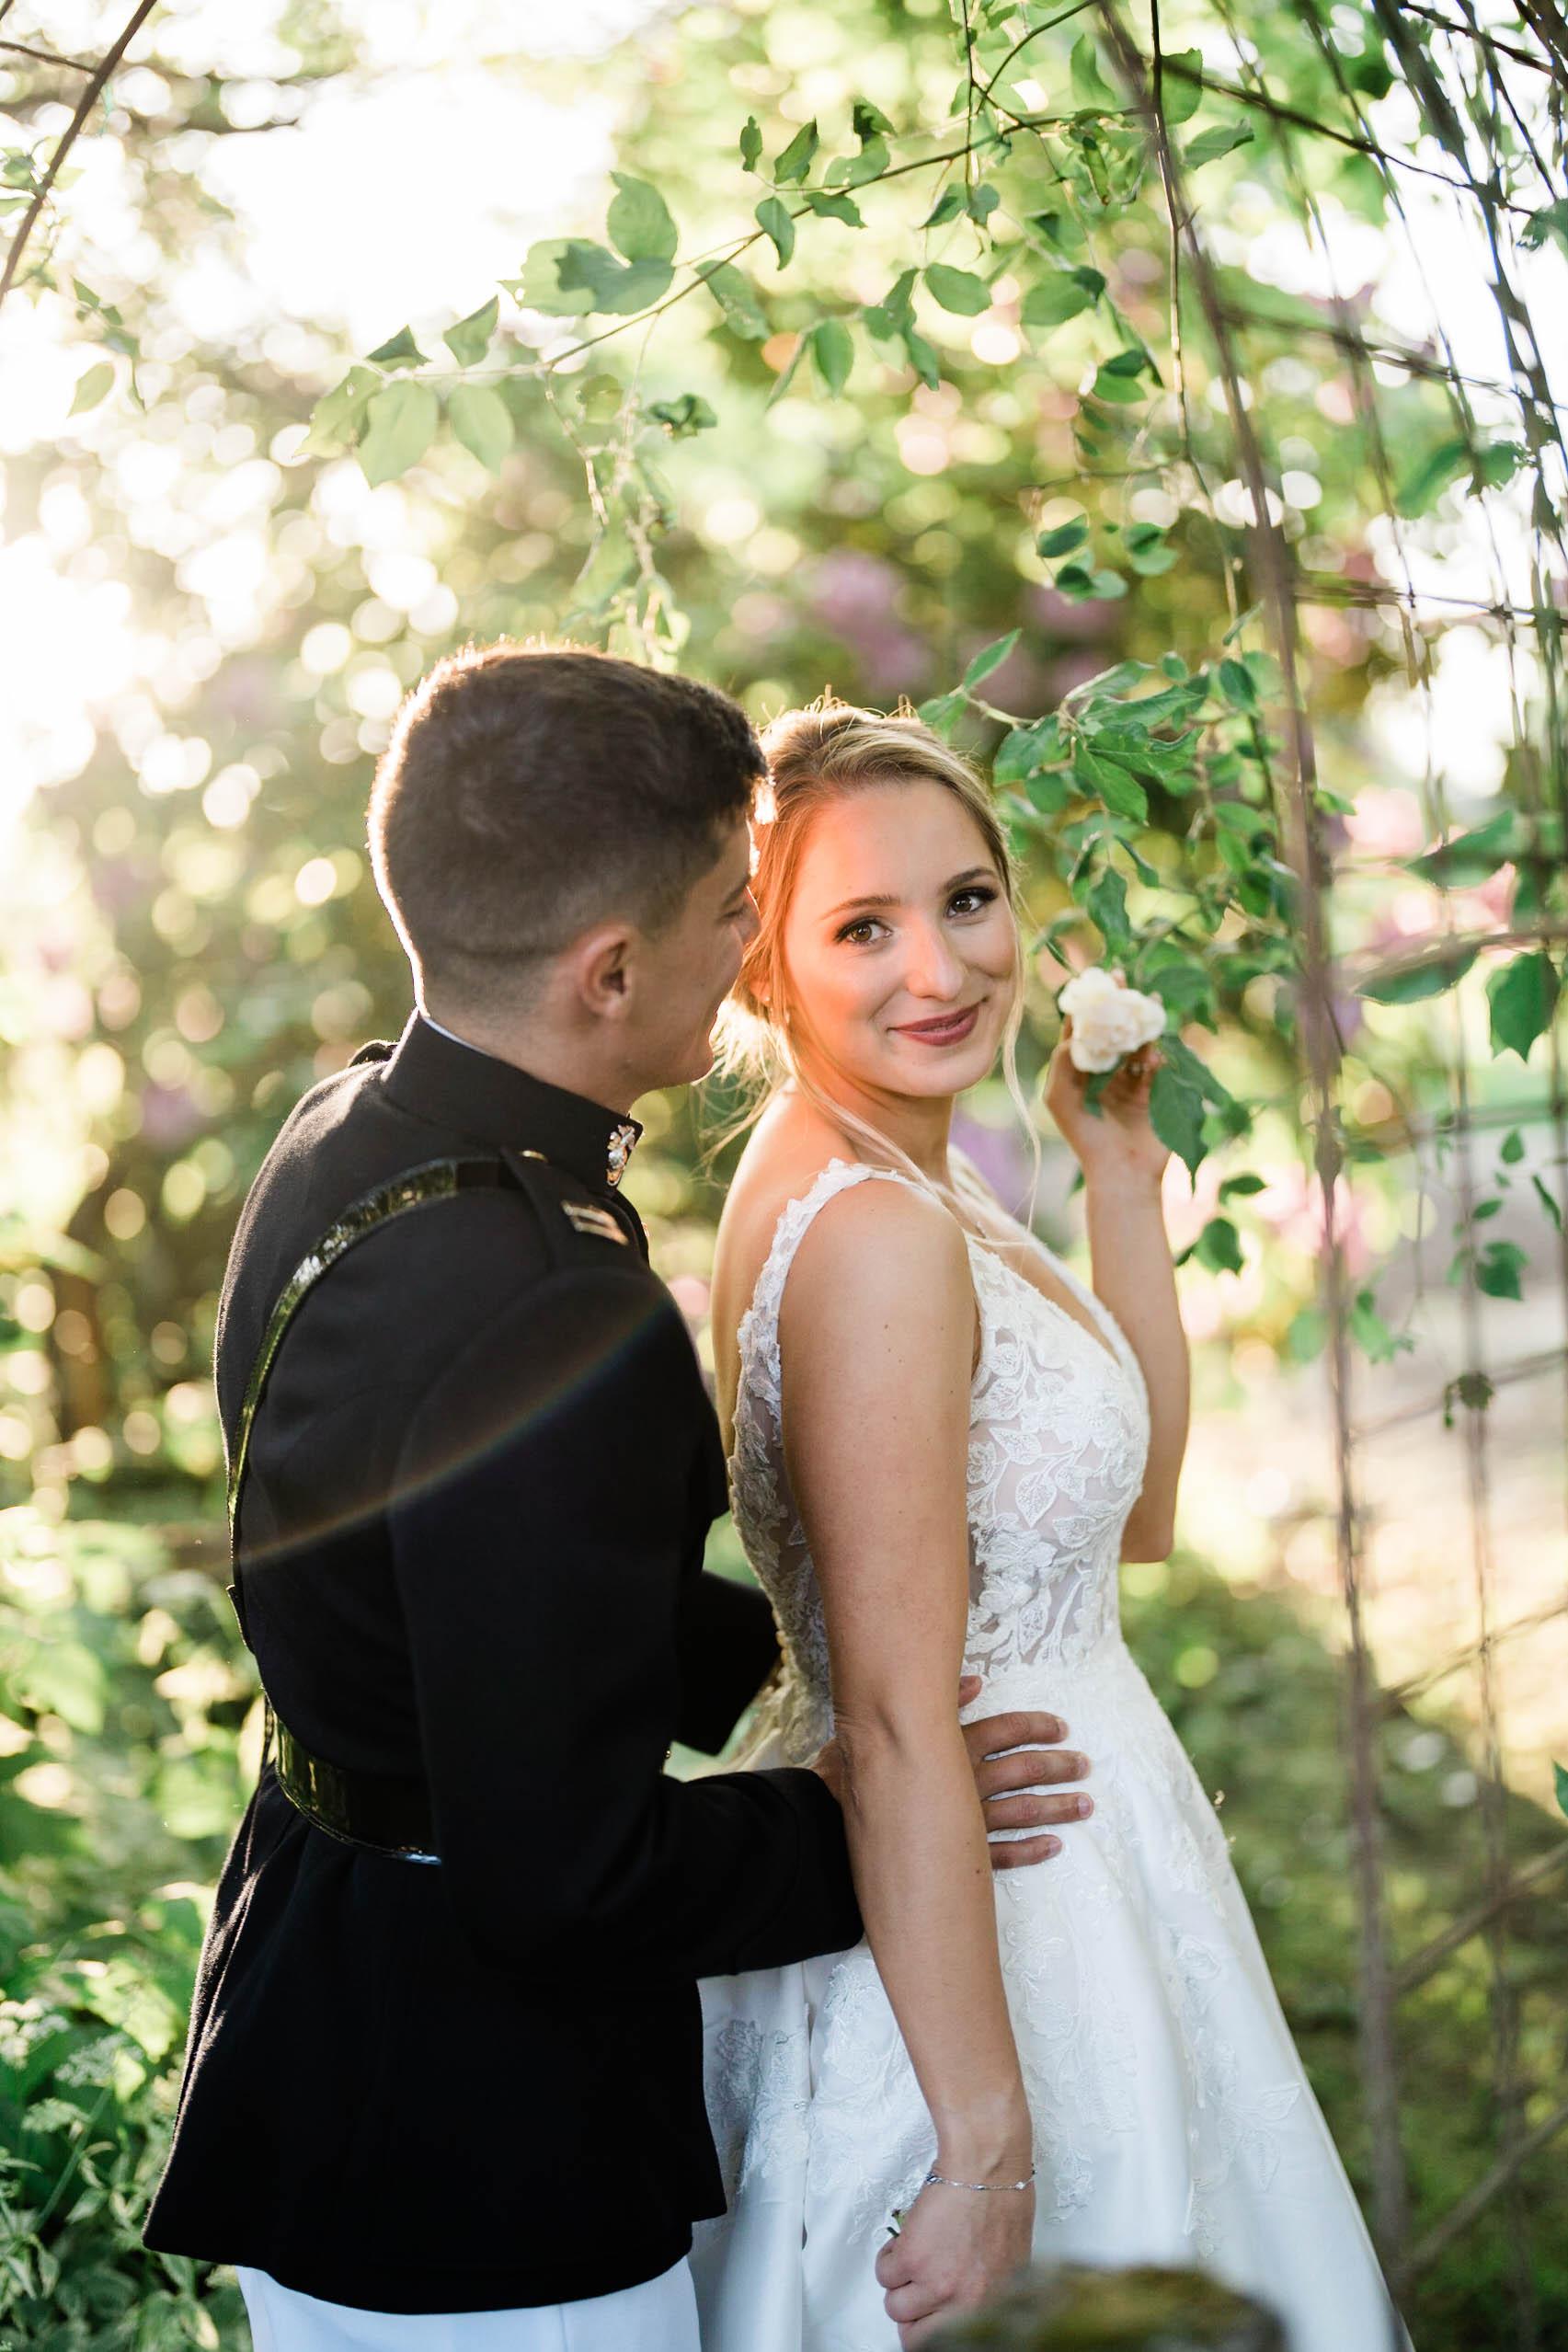 craven farm wedding has garden venue for couples portraits